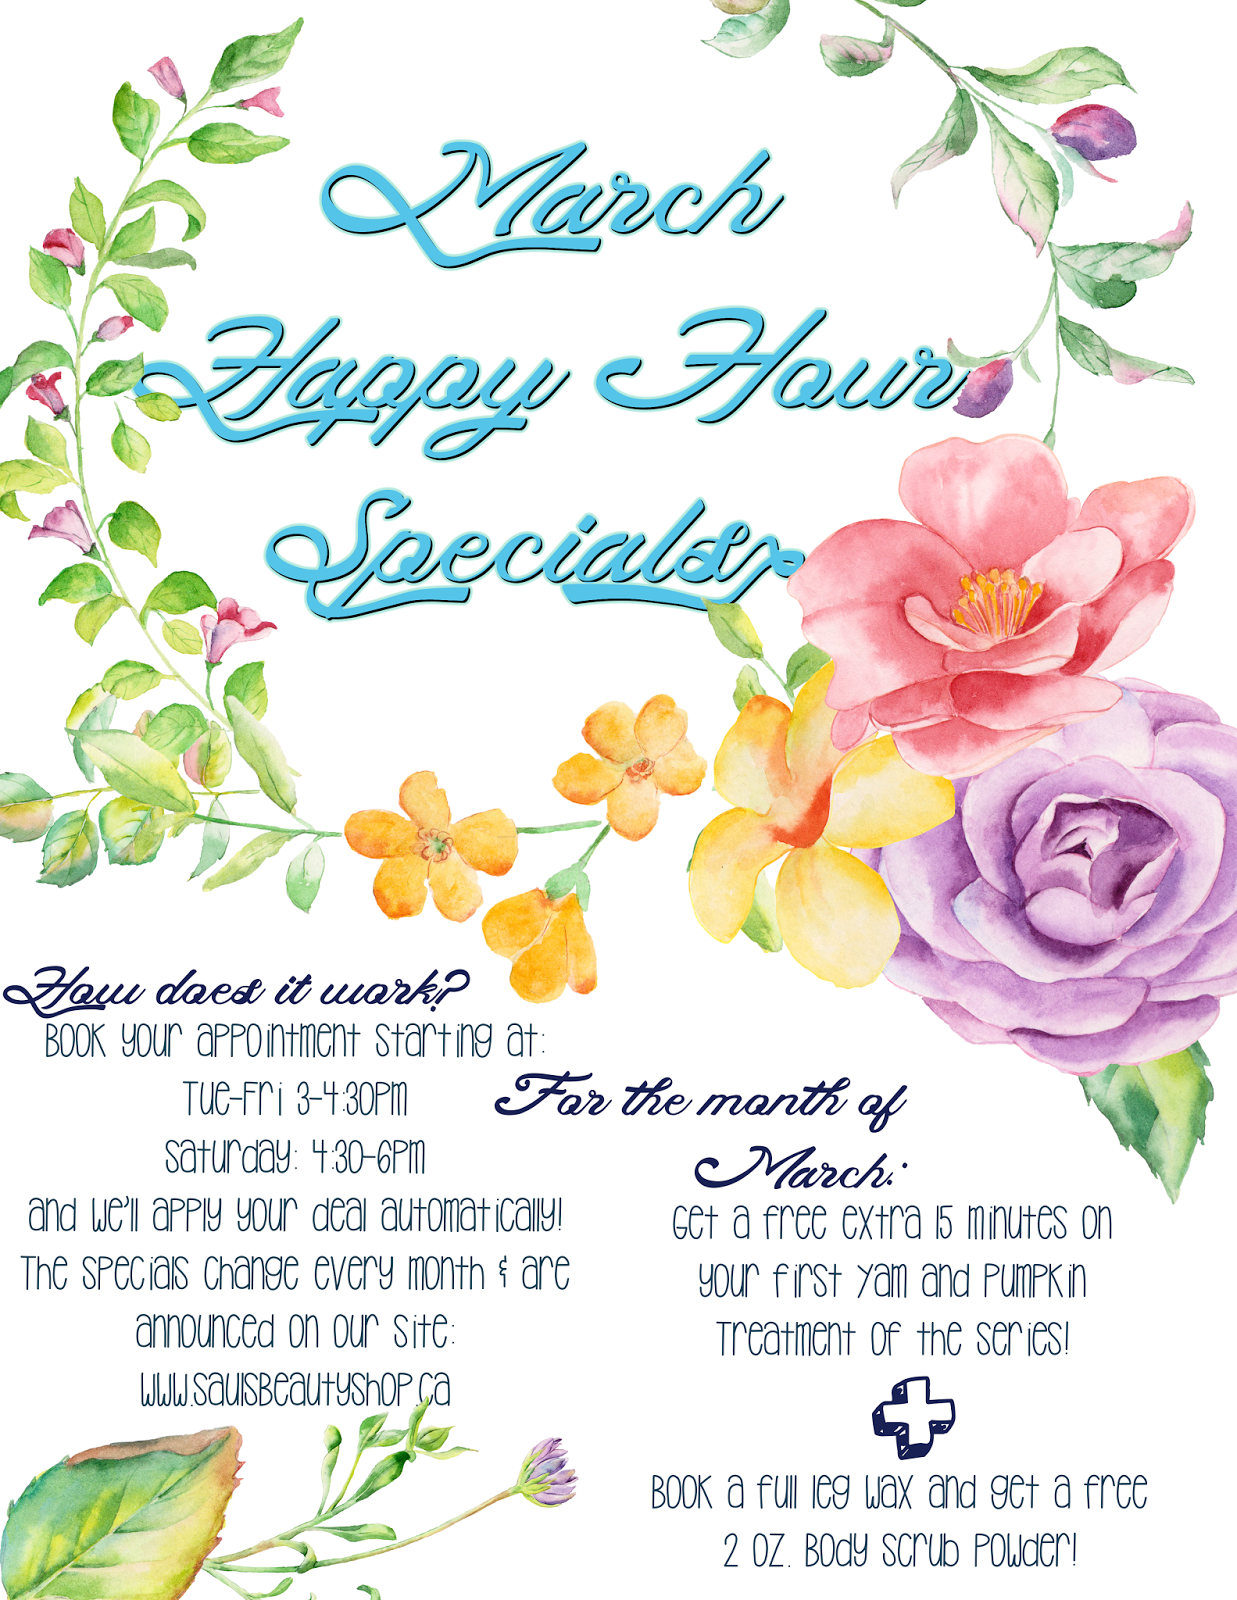 March Happy Hour Specials Sauls Beauty Shop